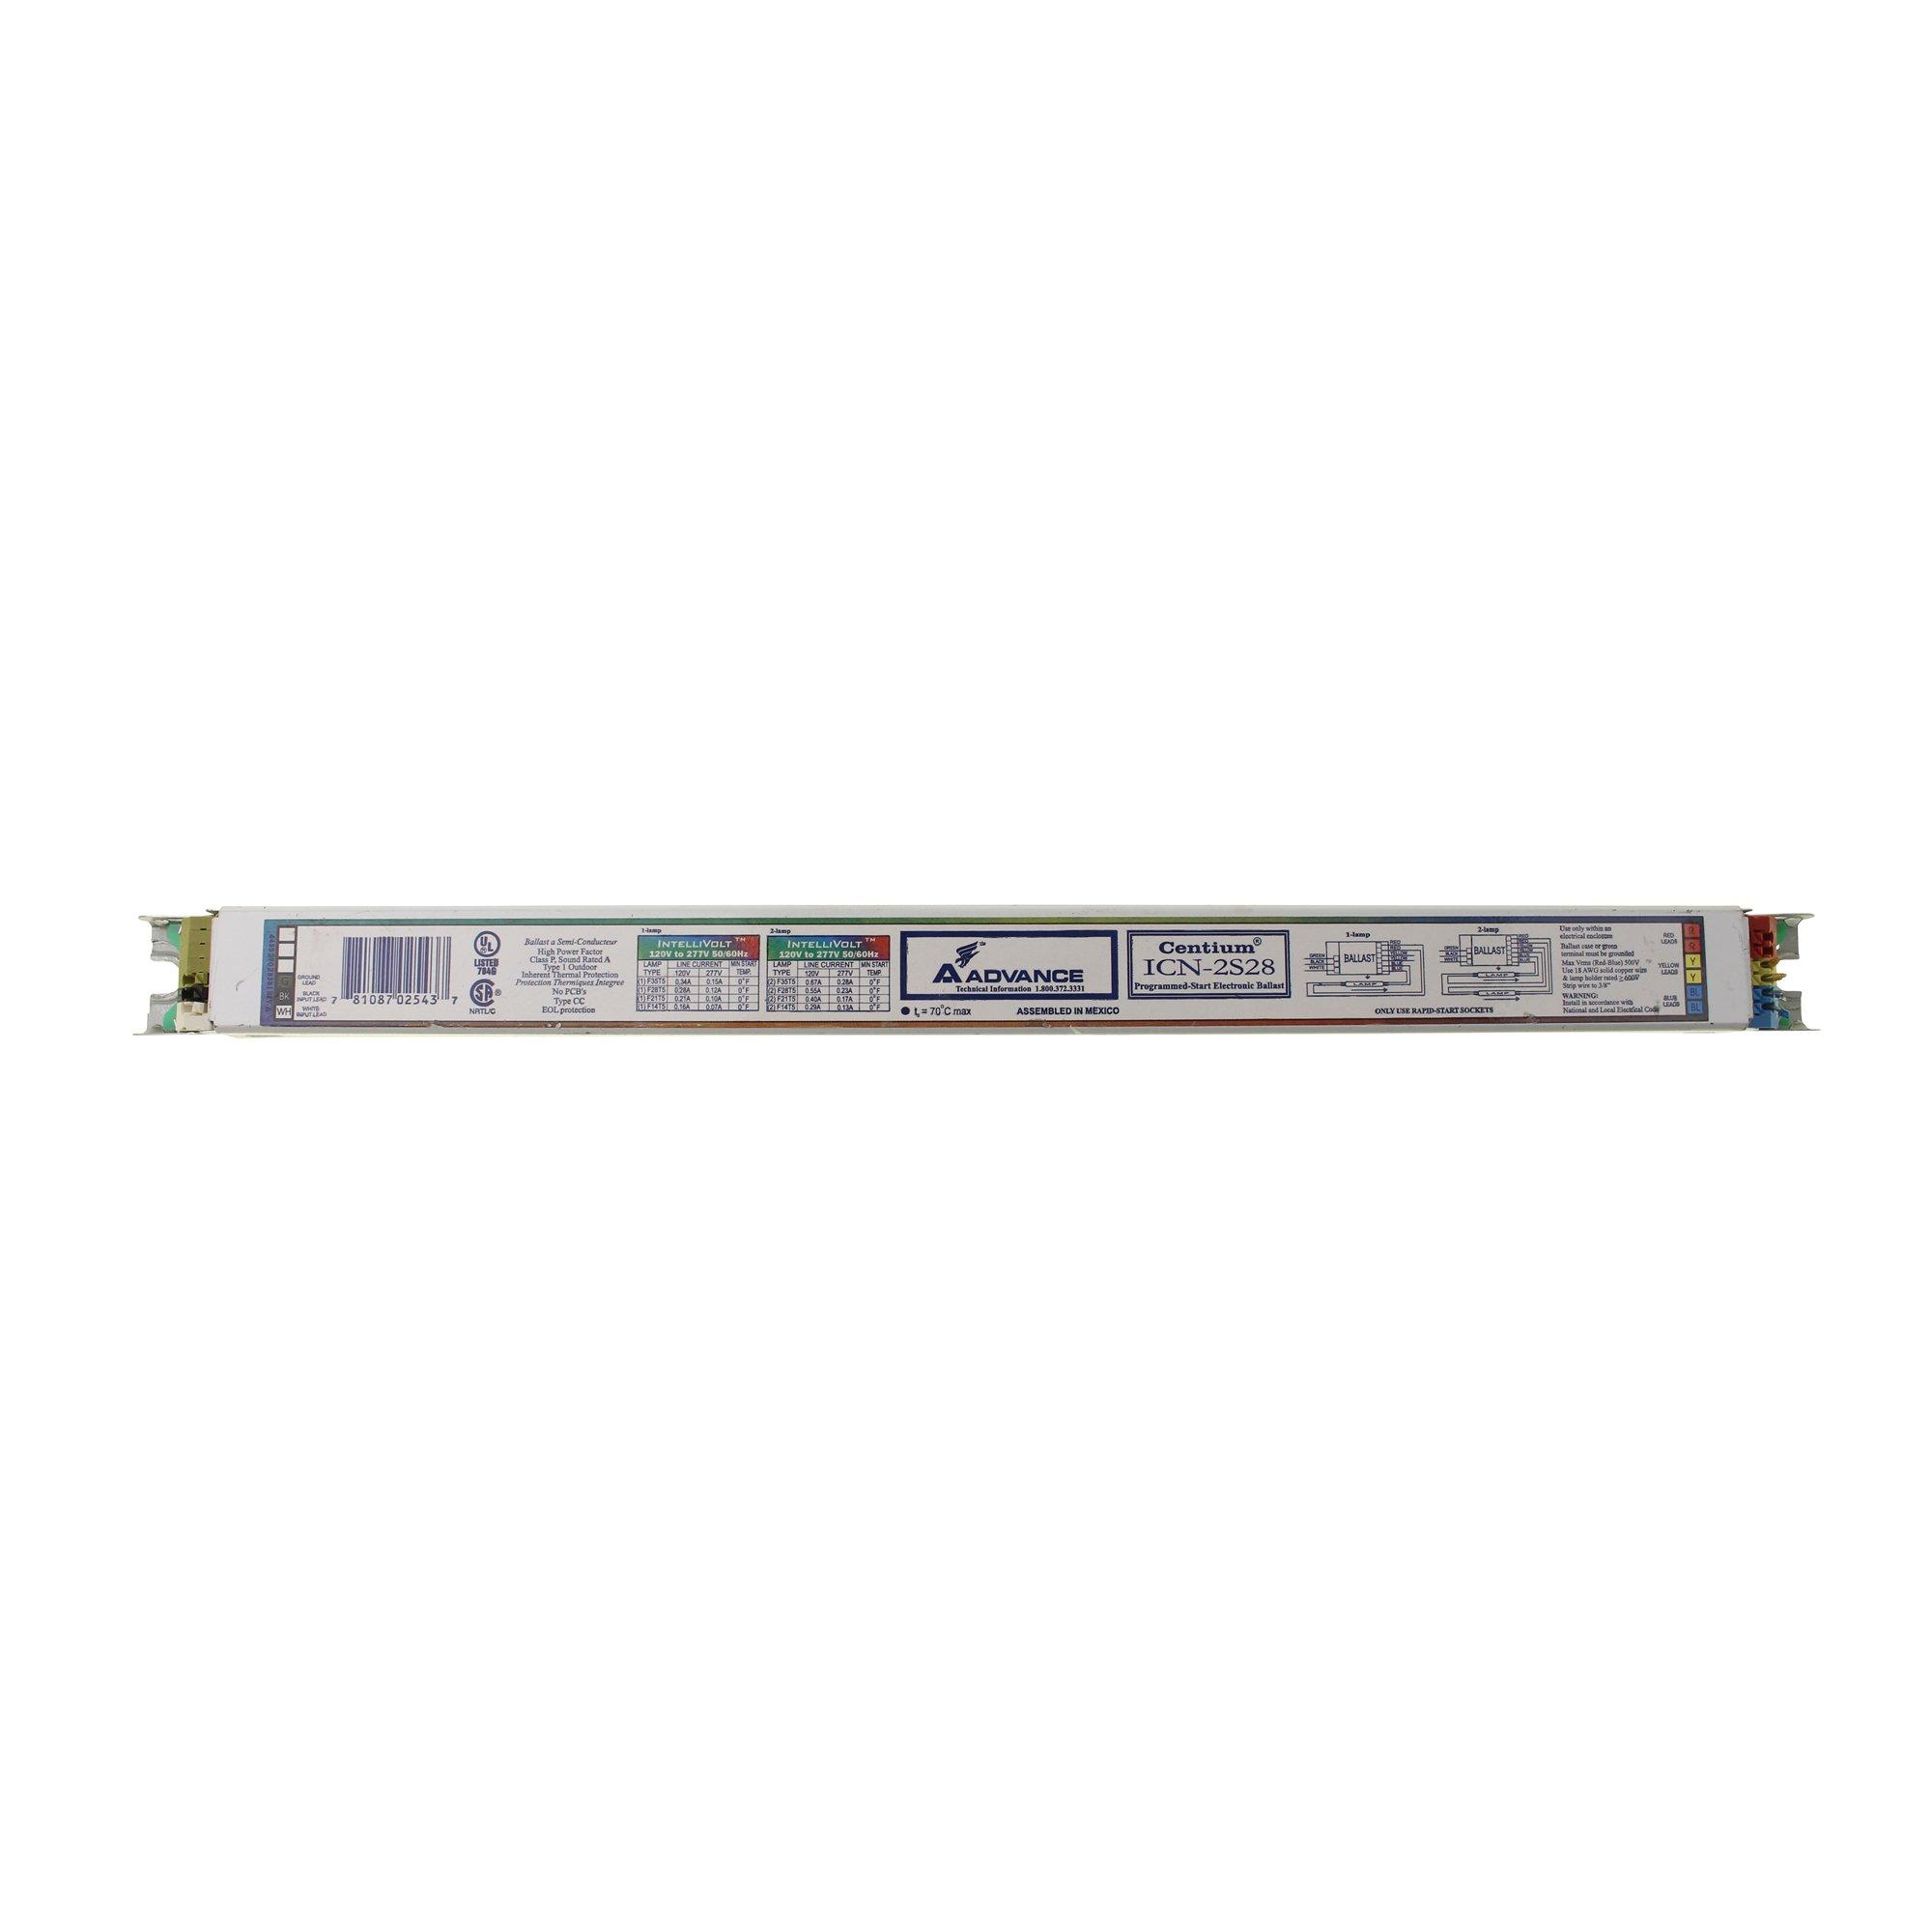 Advanced ICN-2S28 Programmed Fluorescent Ballast, 2 Lamp, T5, 32W, 120/277V